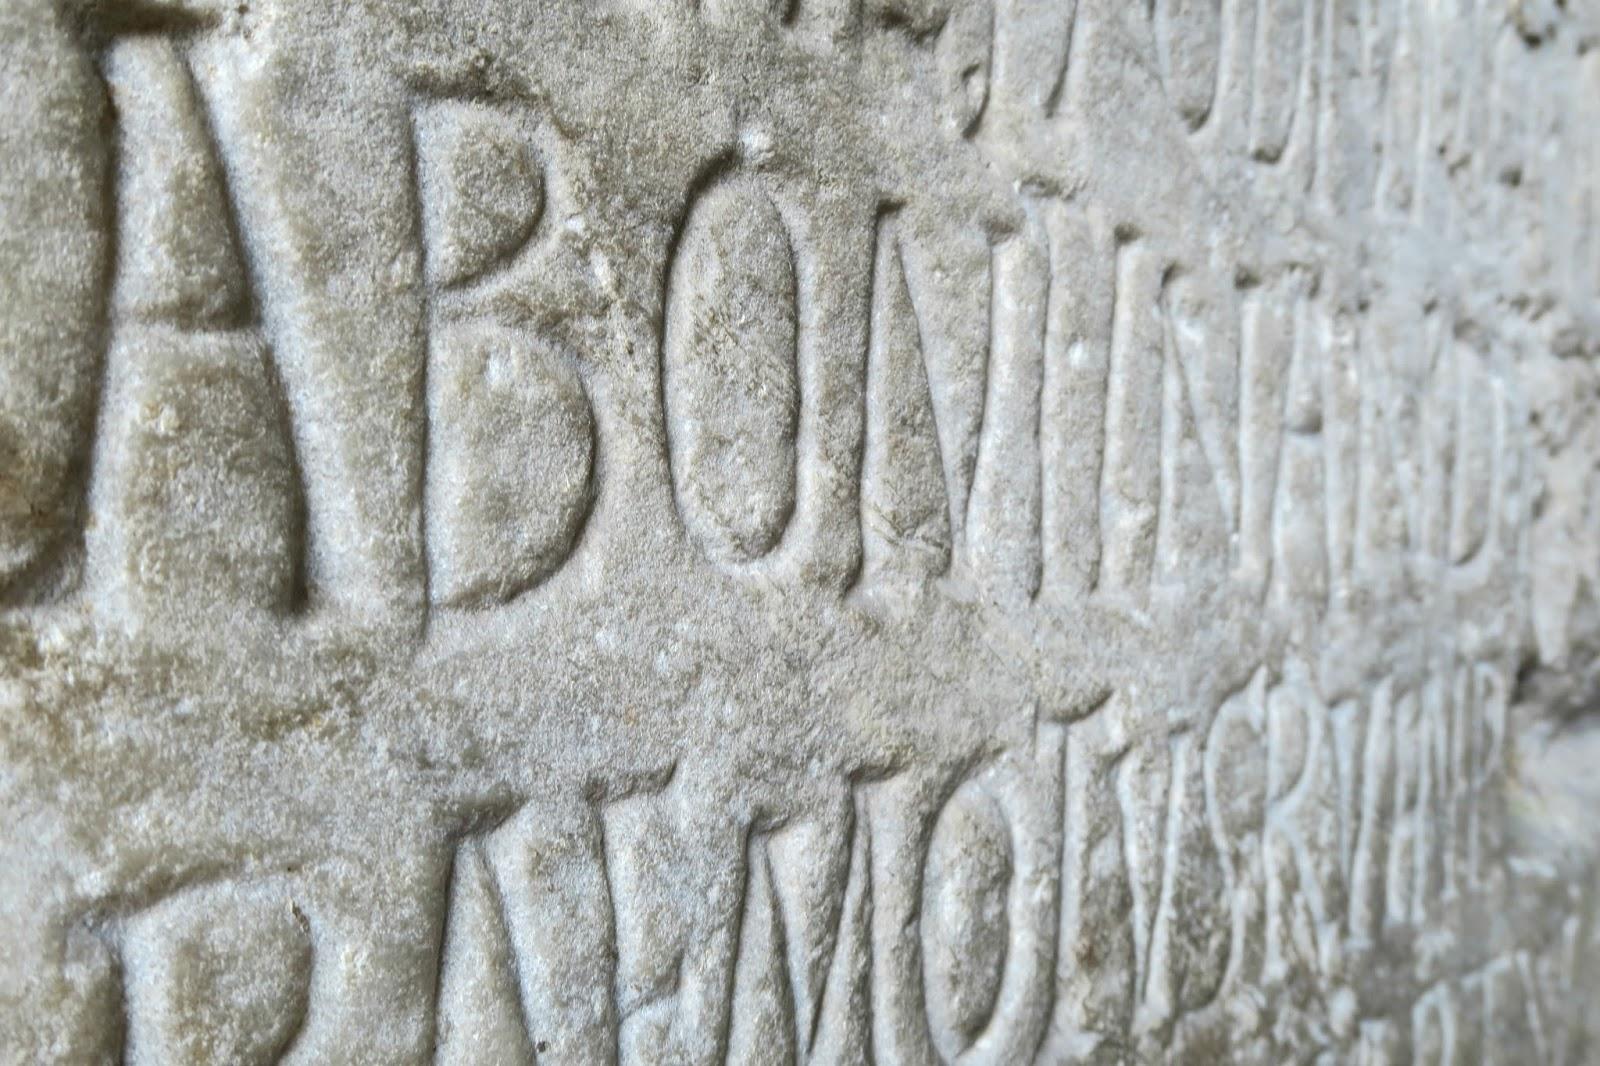 Colosseum writings